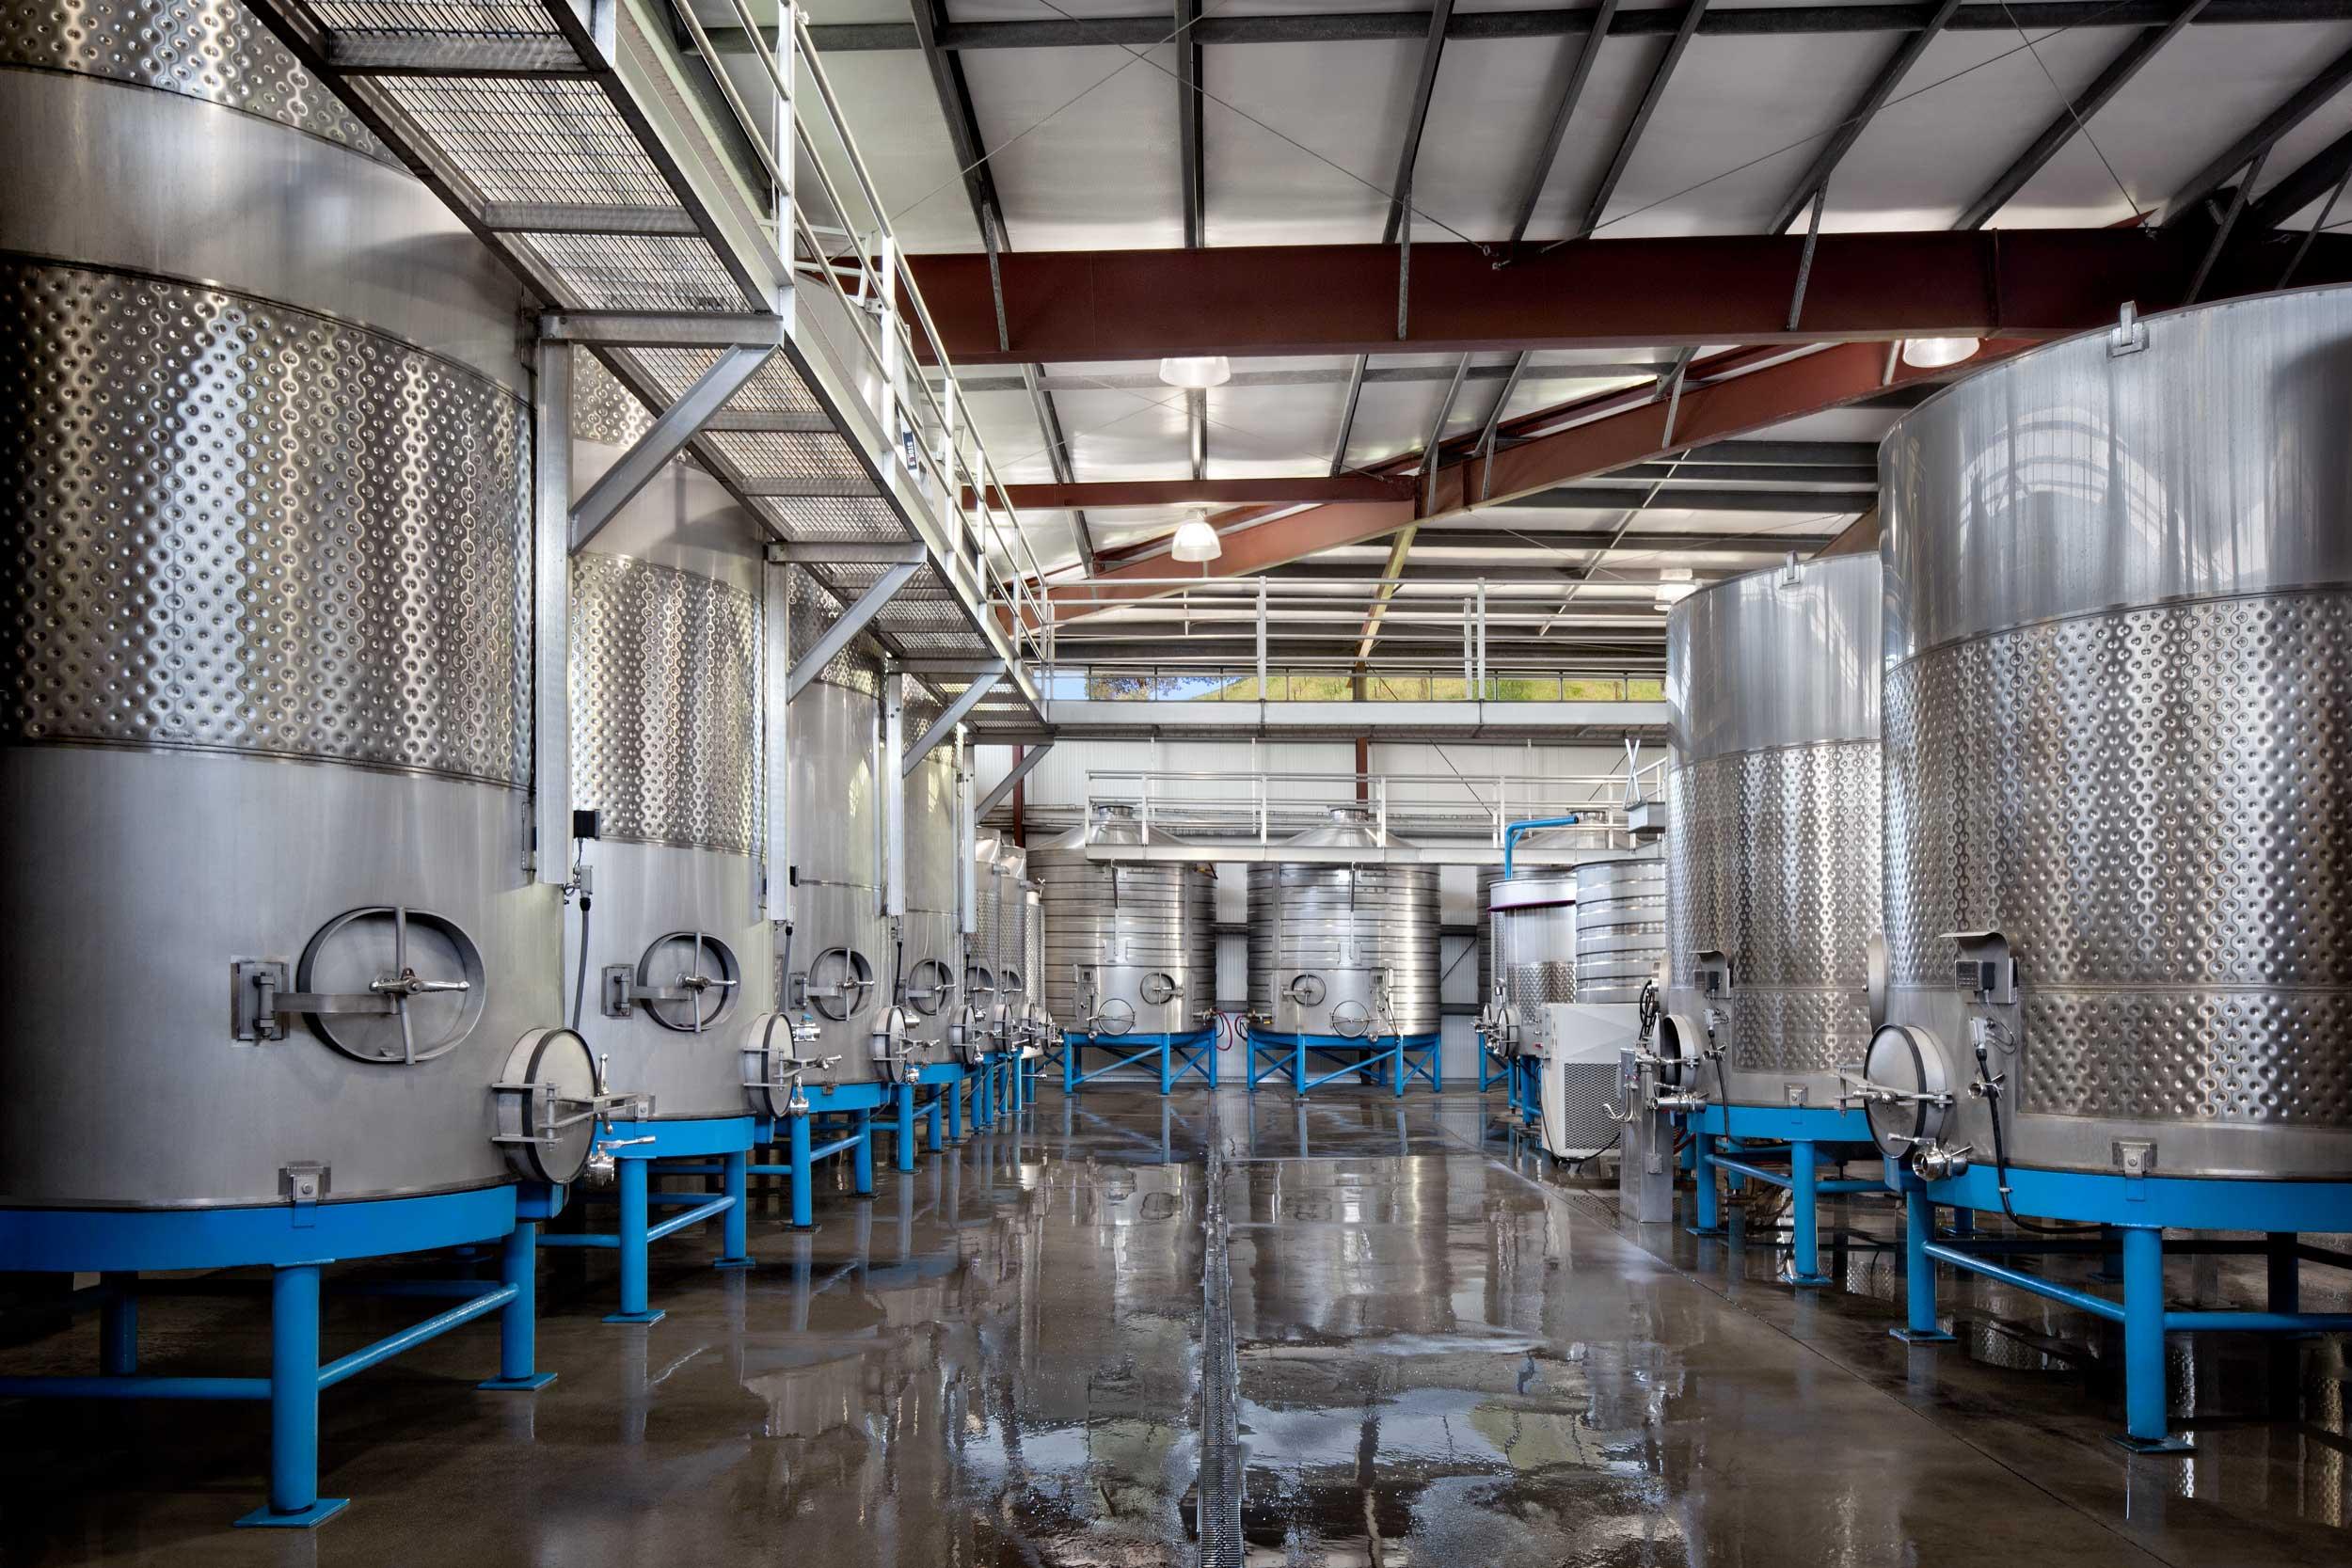 Production Facility Interior